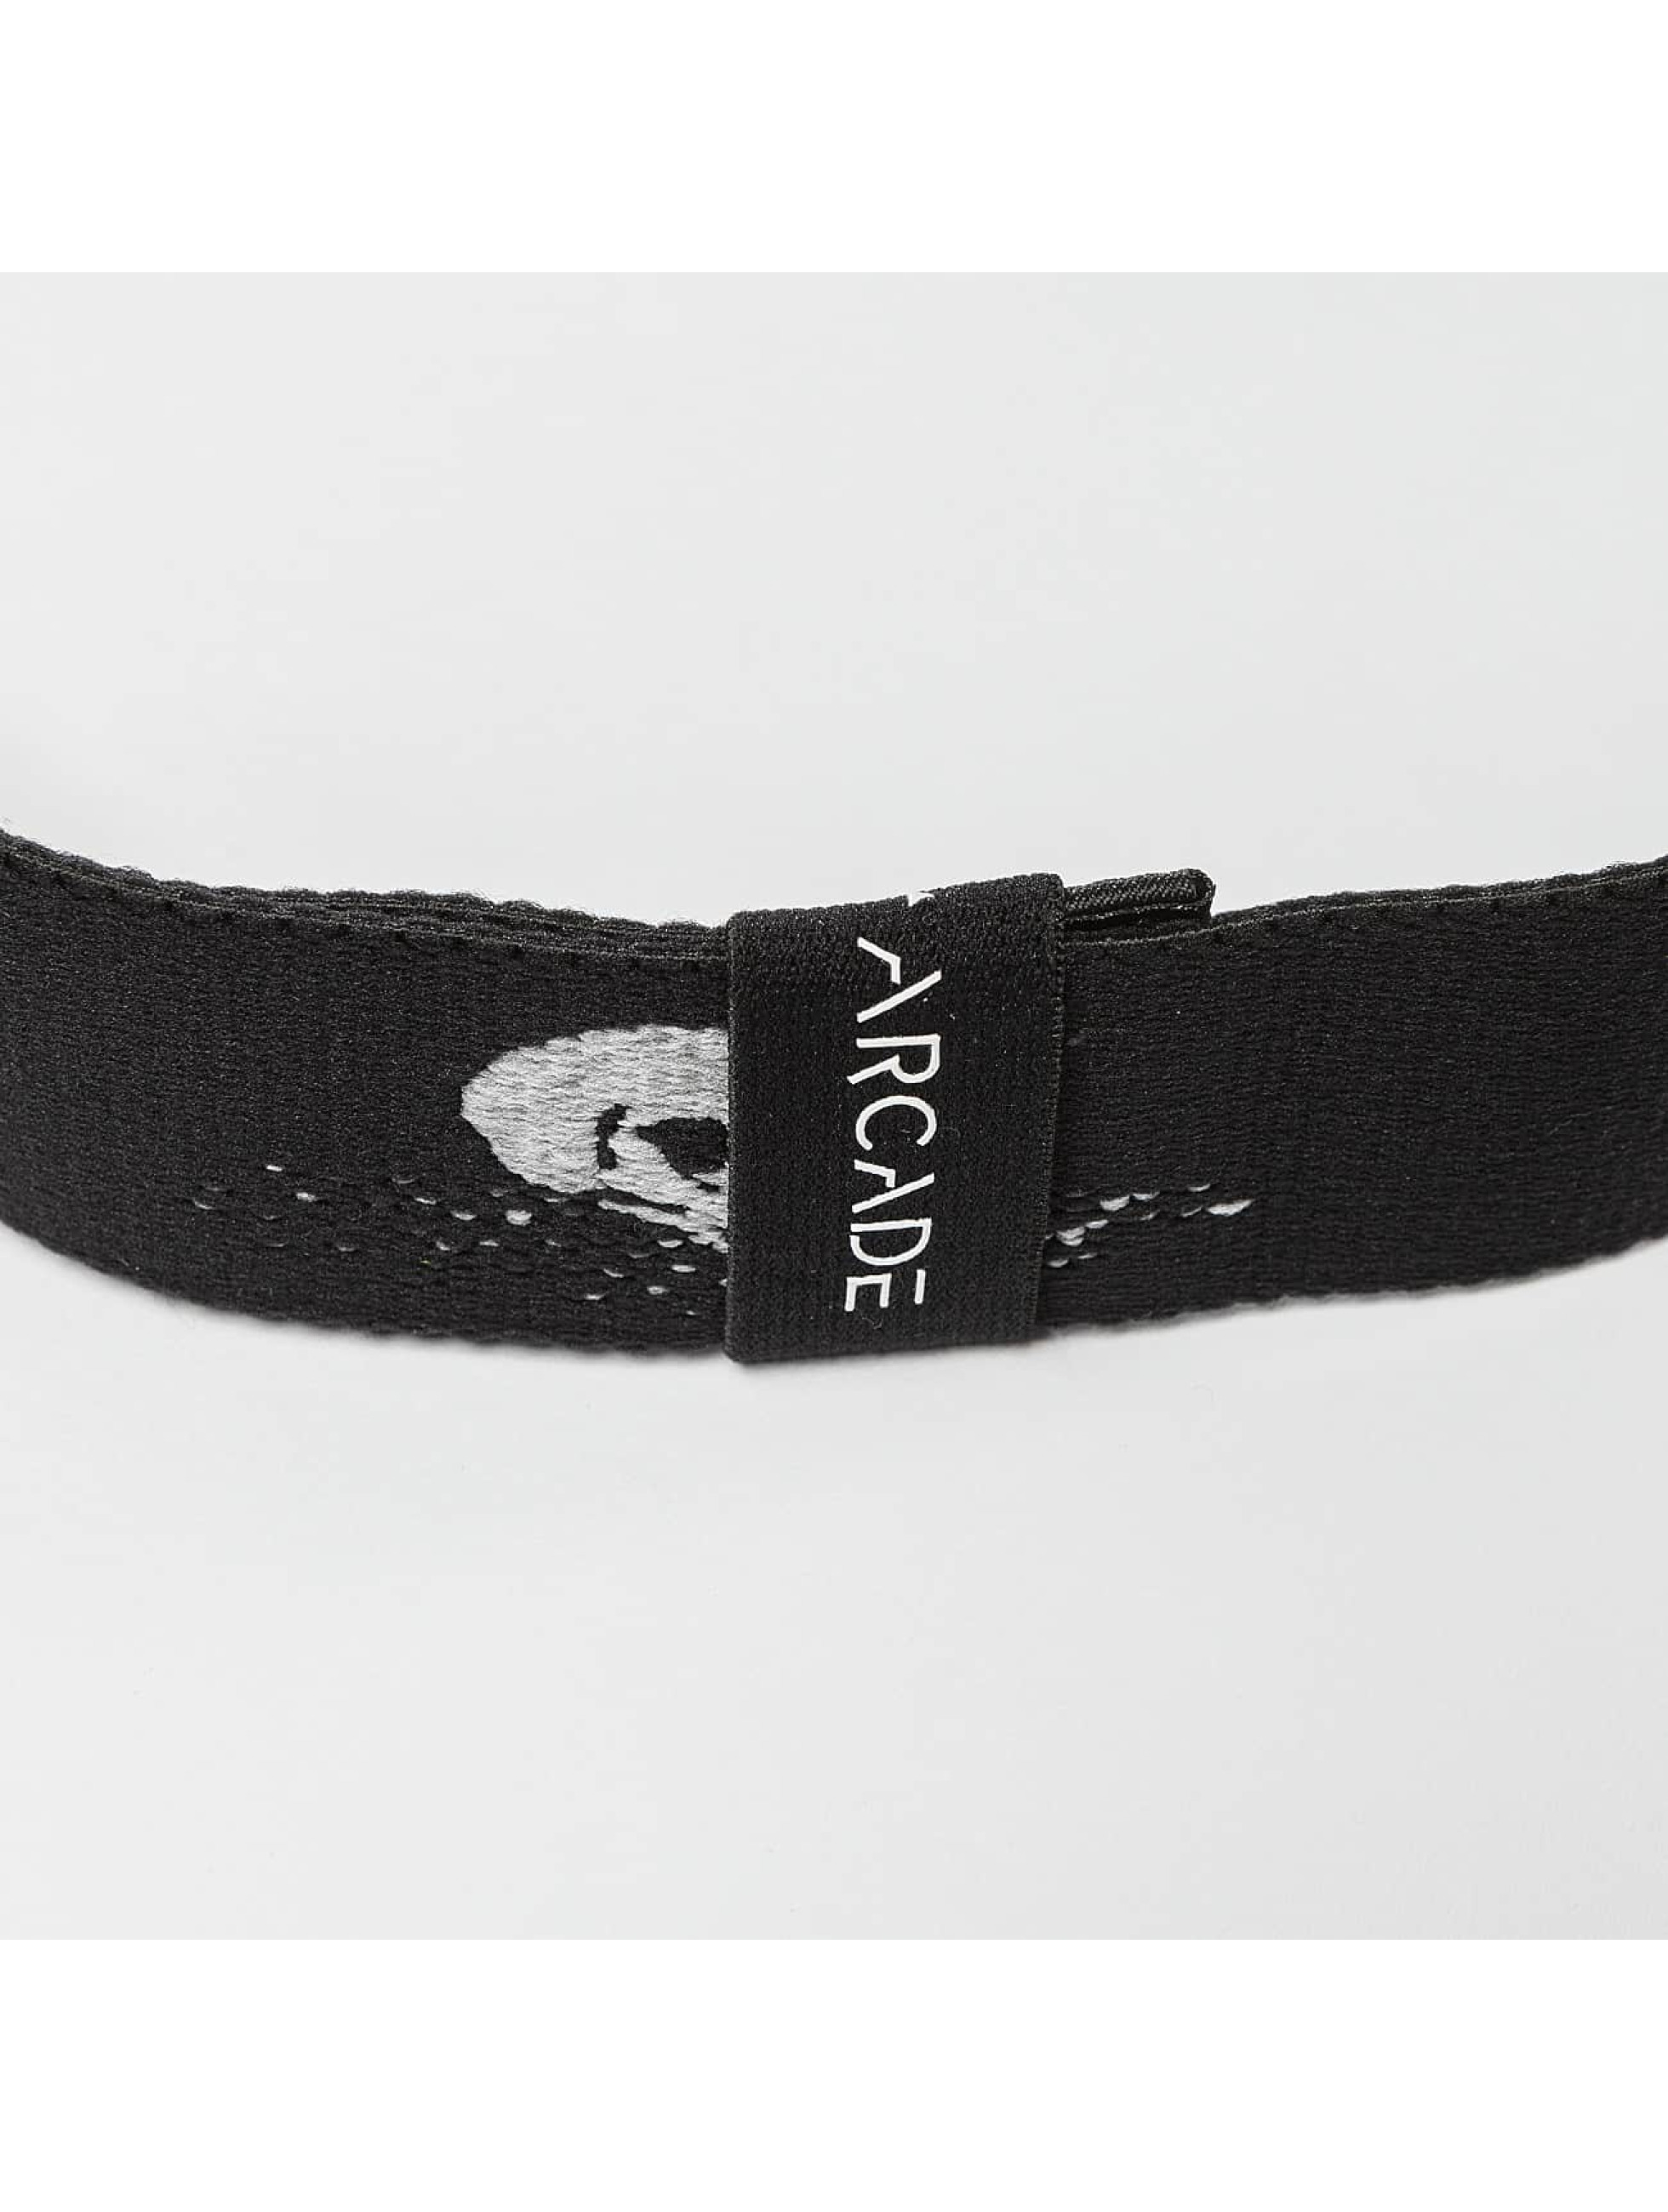 ARCADE Belts The Strand svart